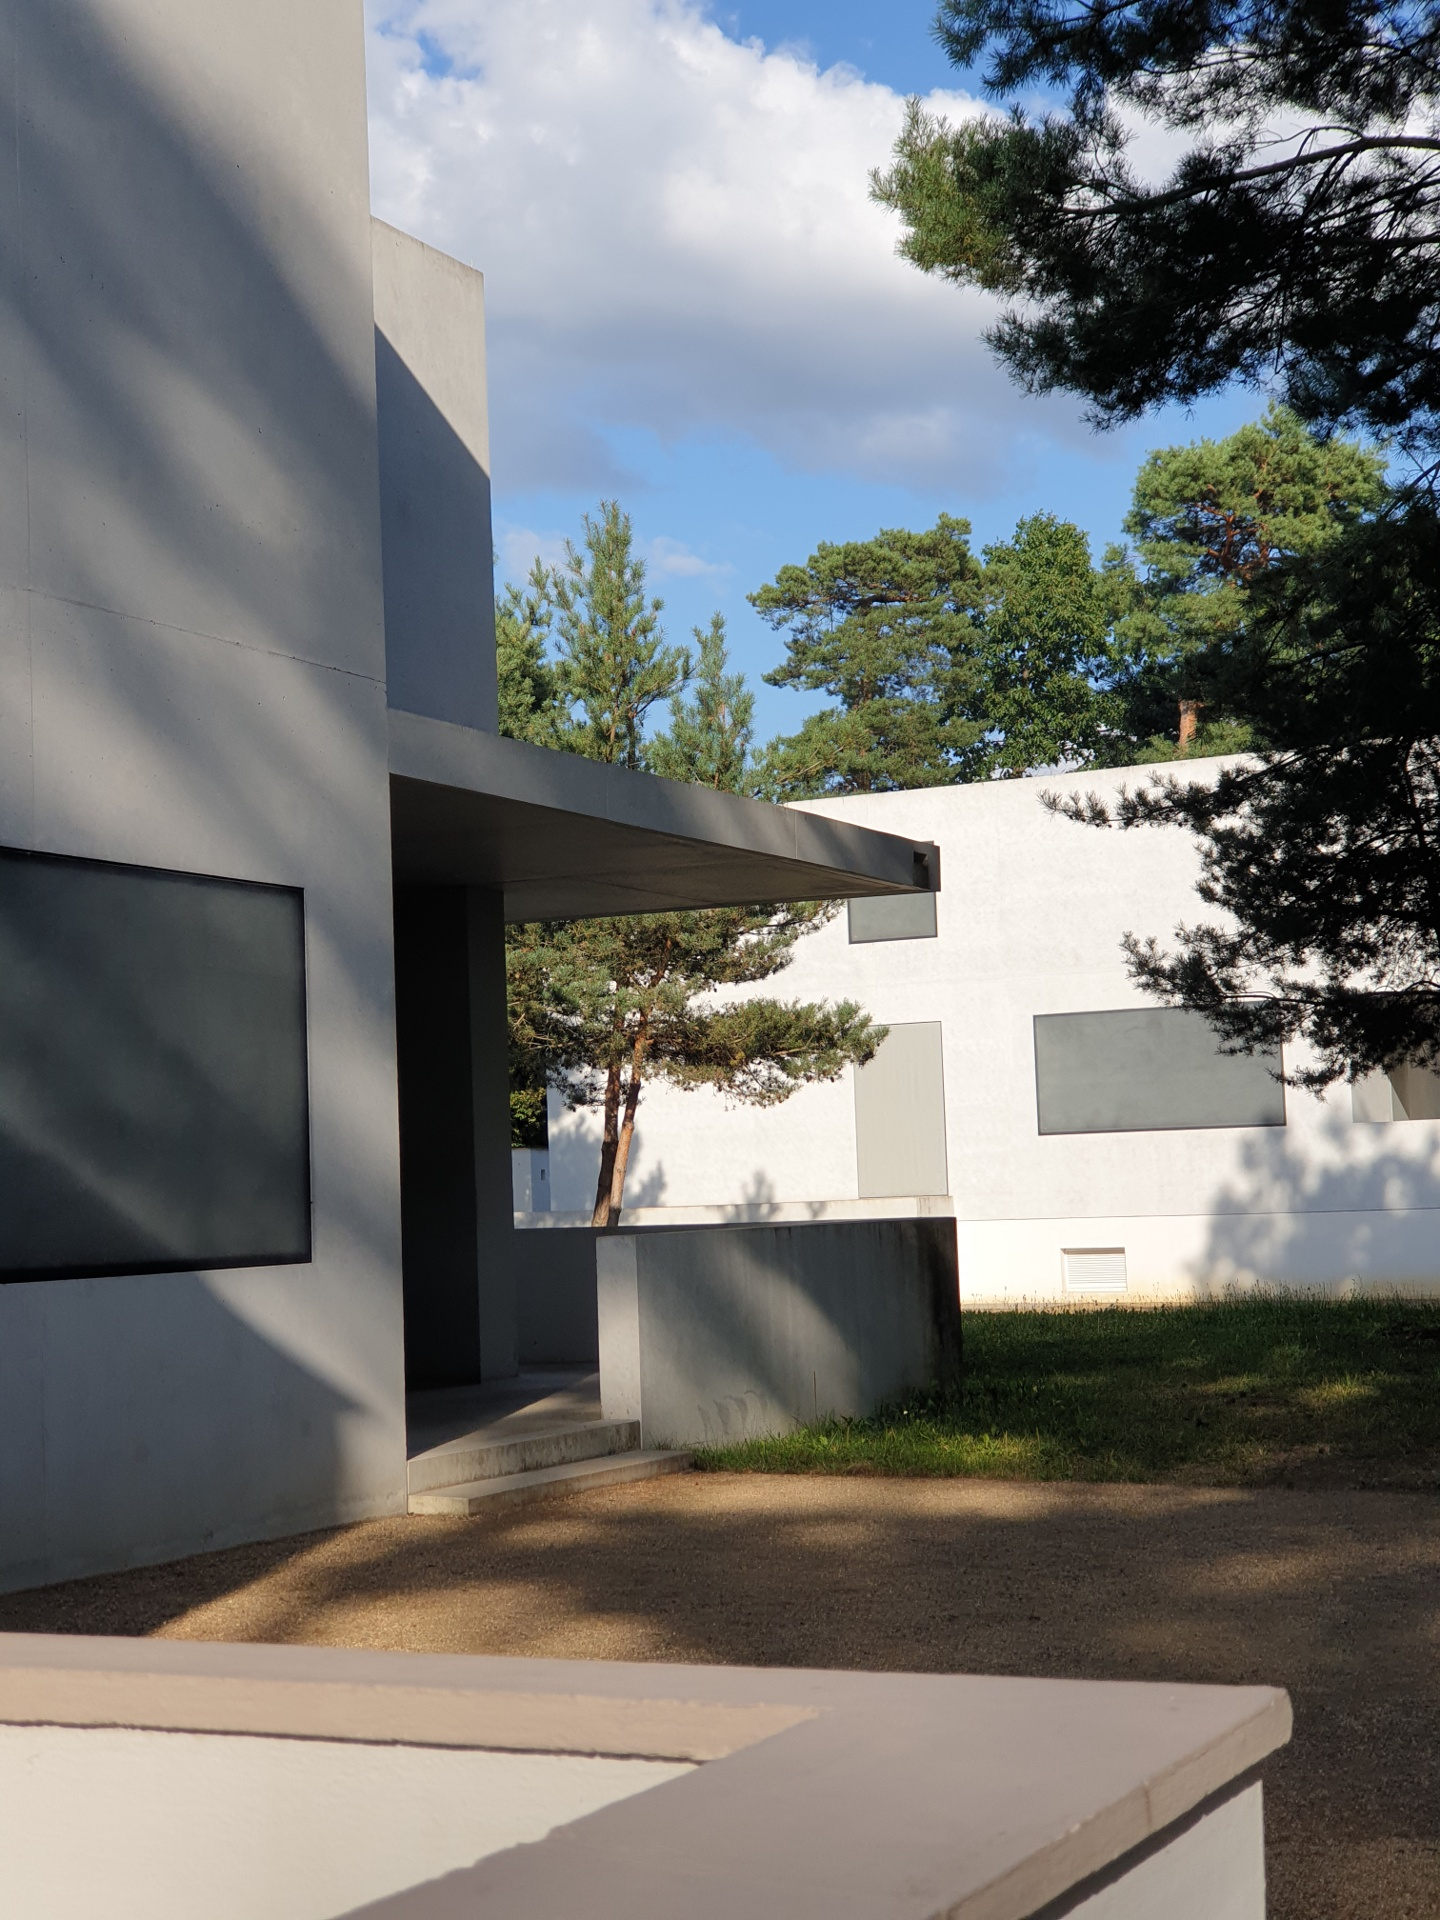 Dessau, Meisterhäuser